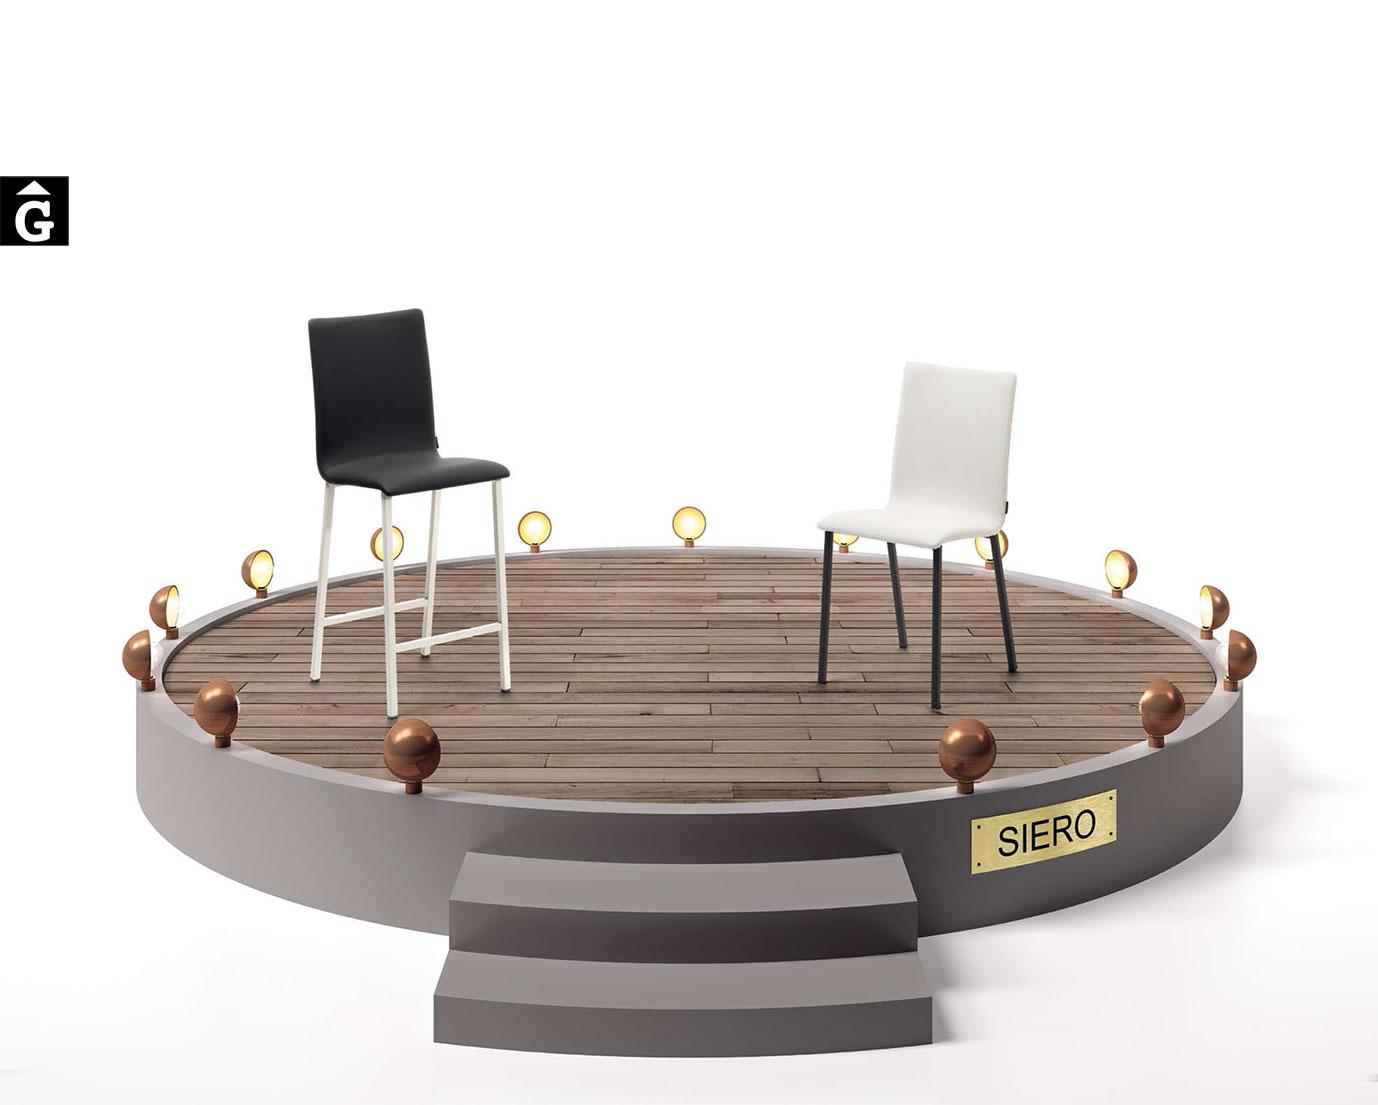 Cadira siero mobles gifreu - Cadira barcelona ...